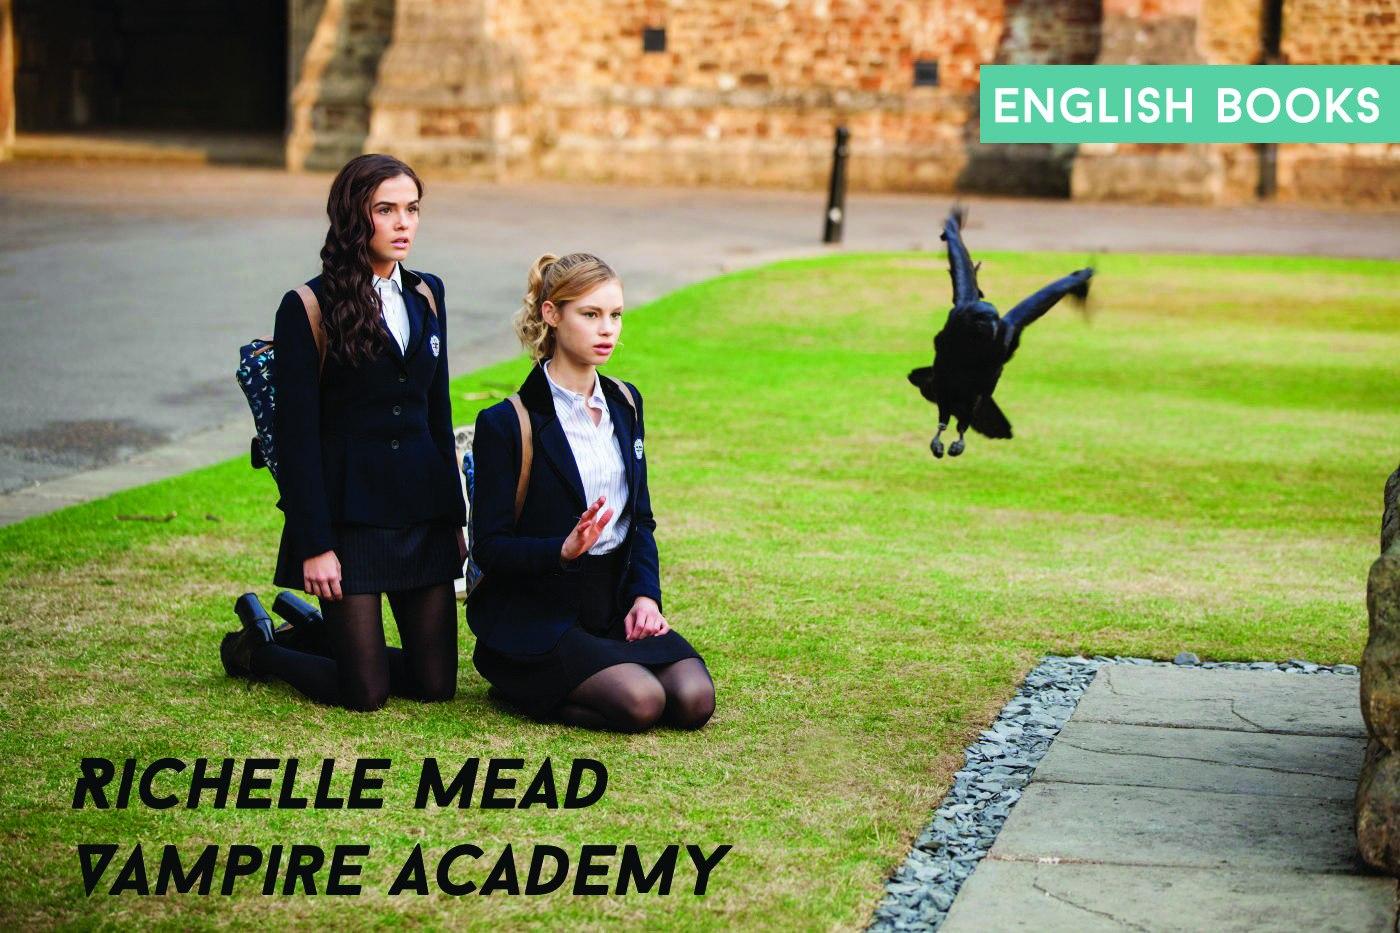 Richelle Mead — Vampire Academy